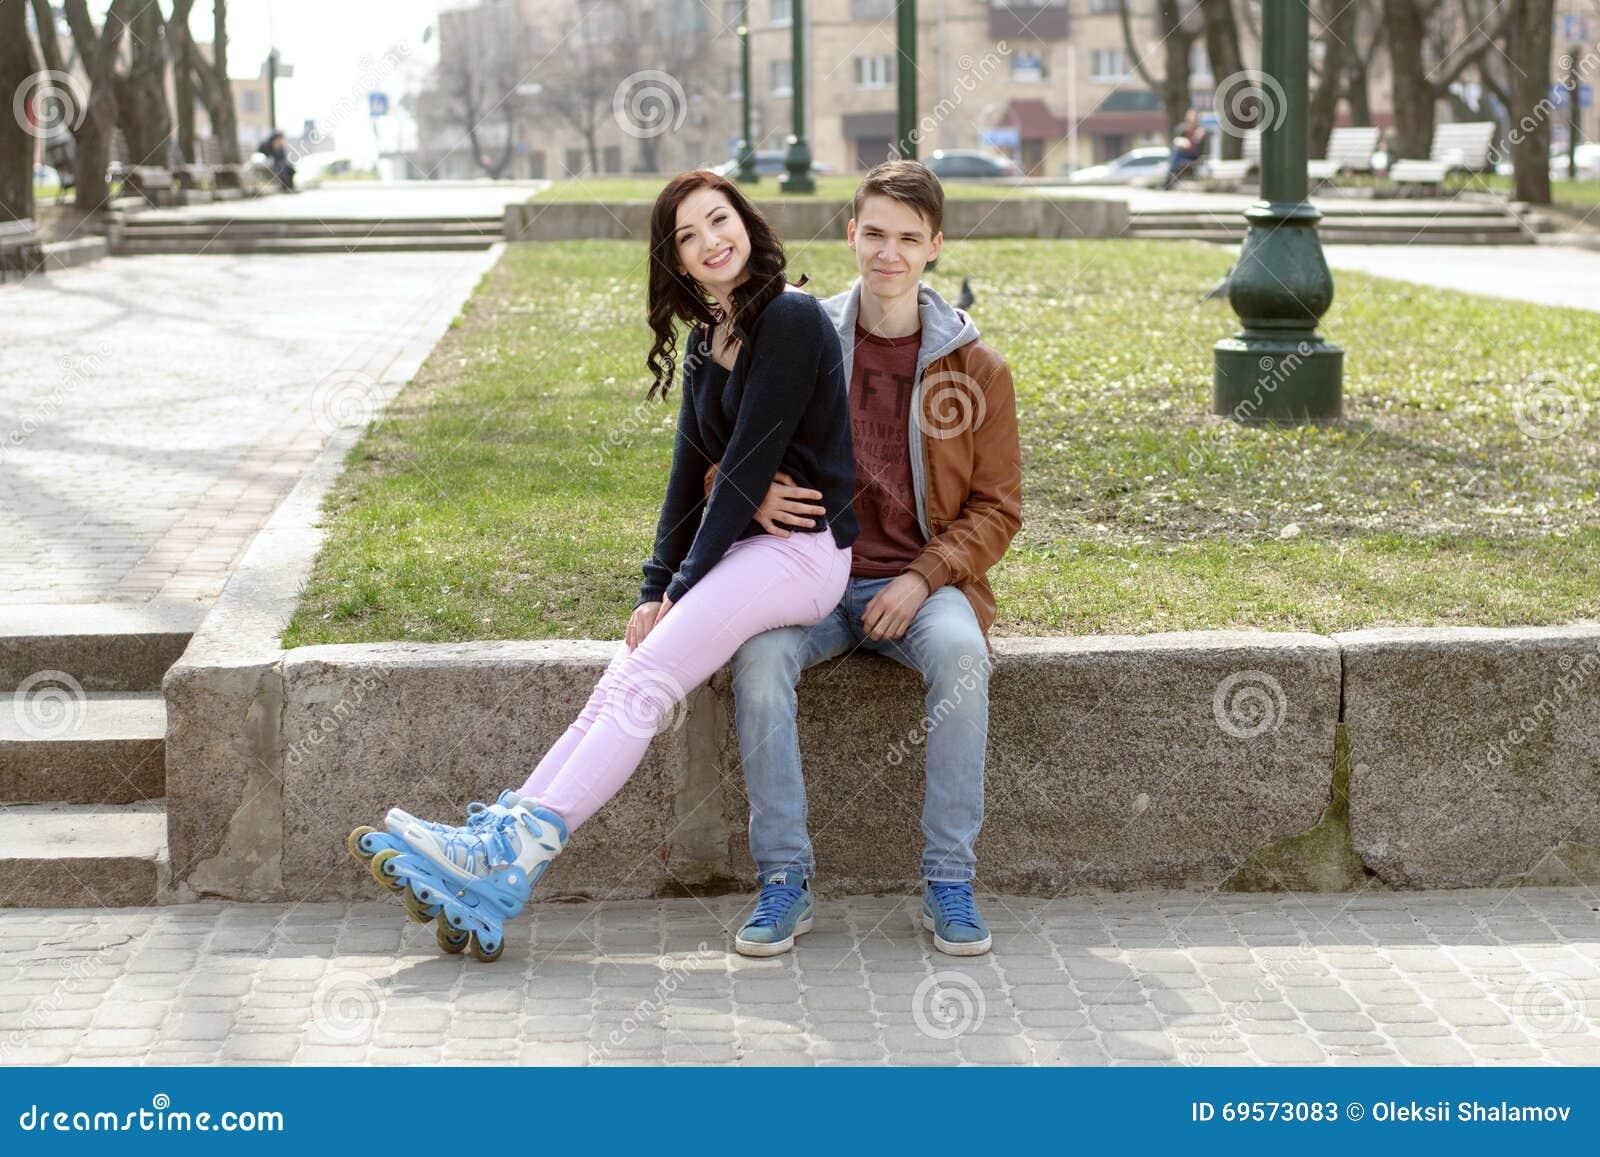 Сидеть на коленях у девушки на фото